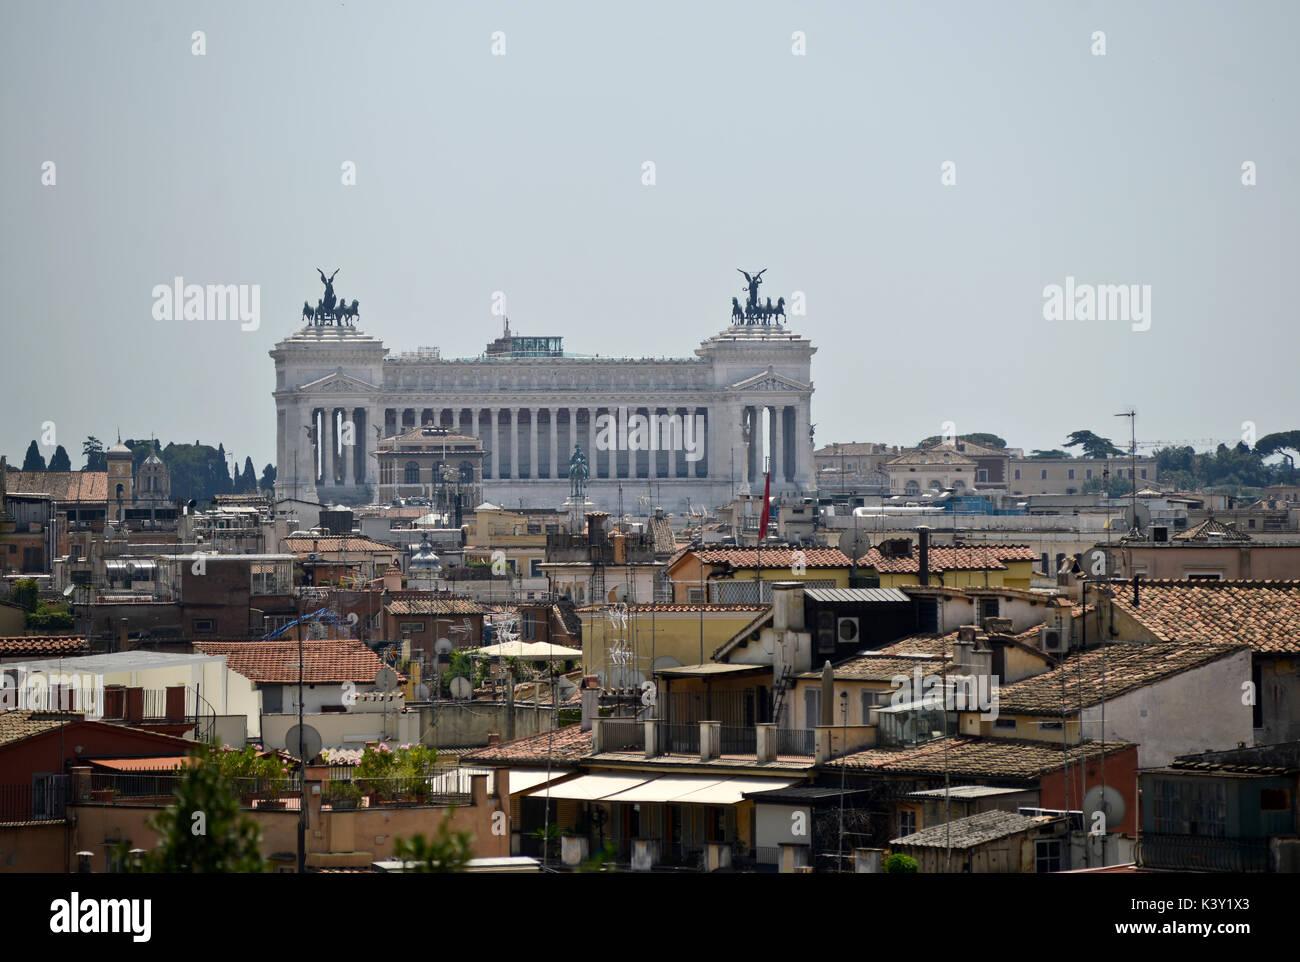 Piazza Venezia, Rome - Stock Image